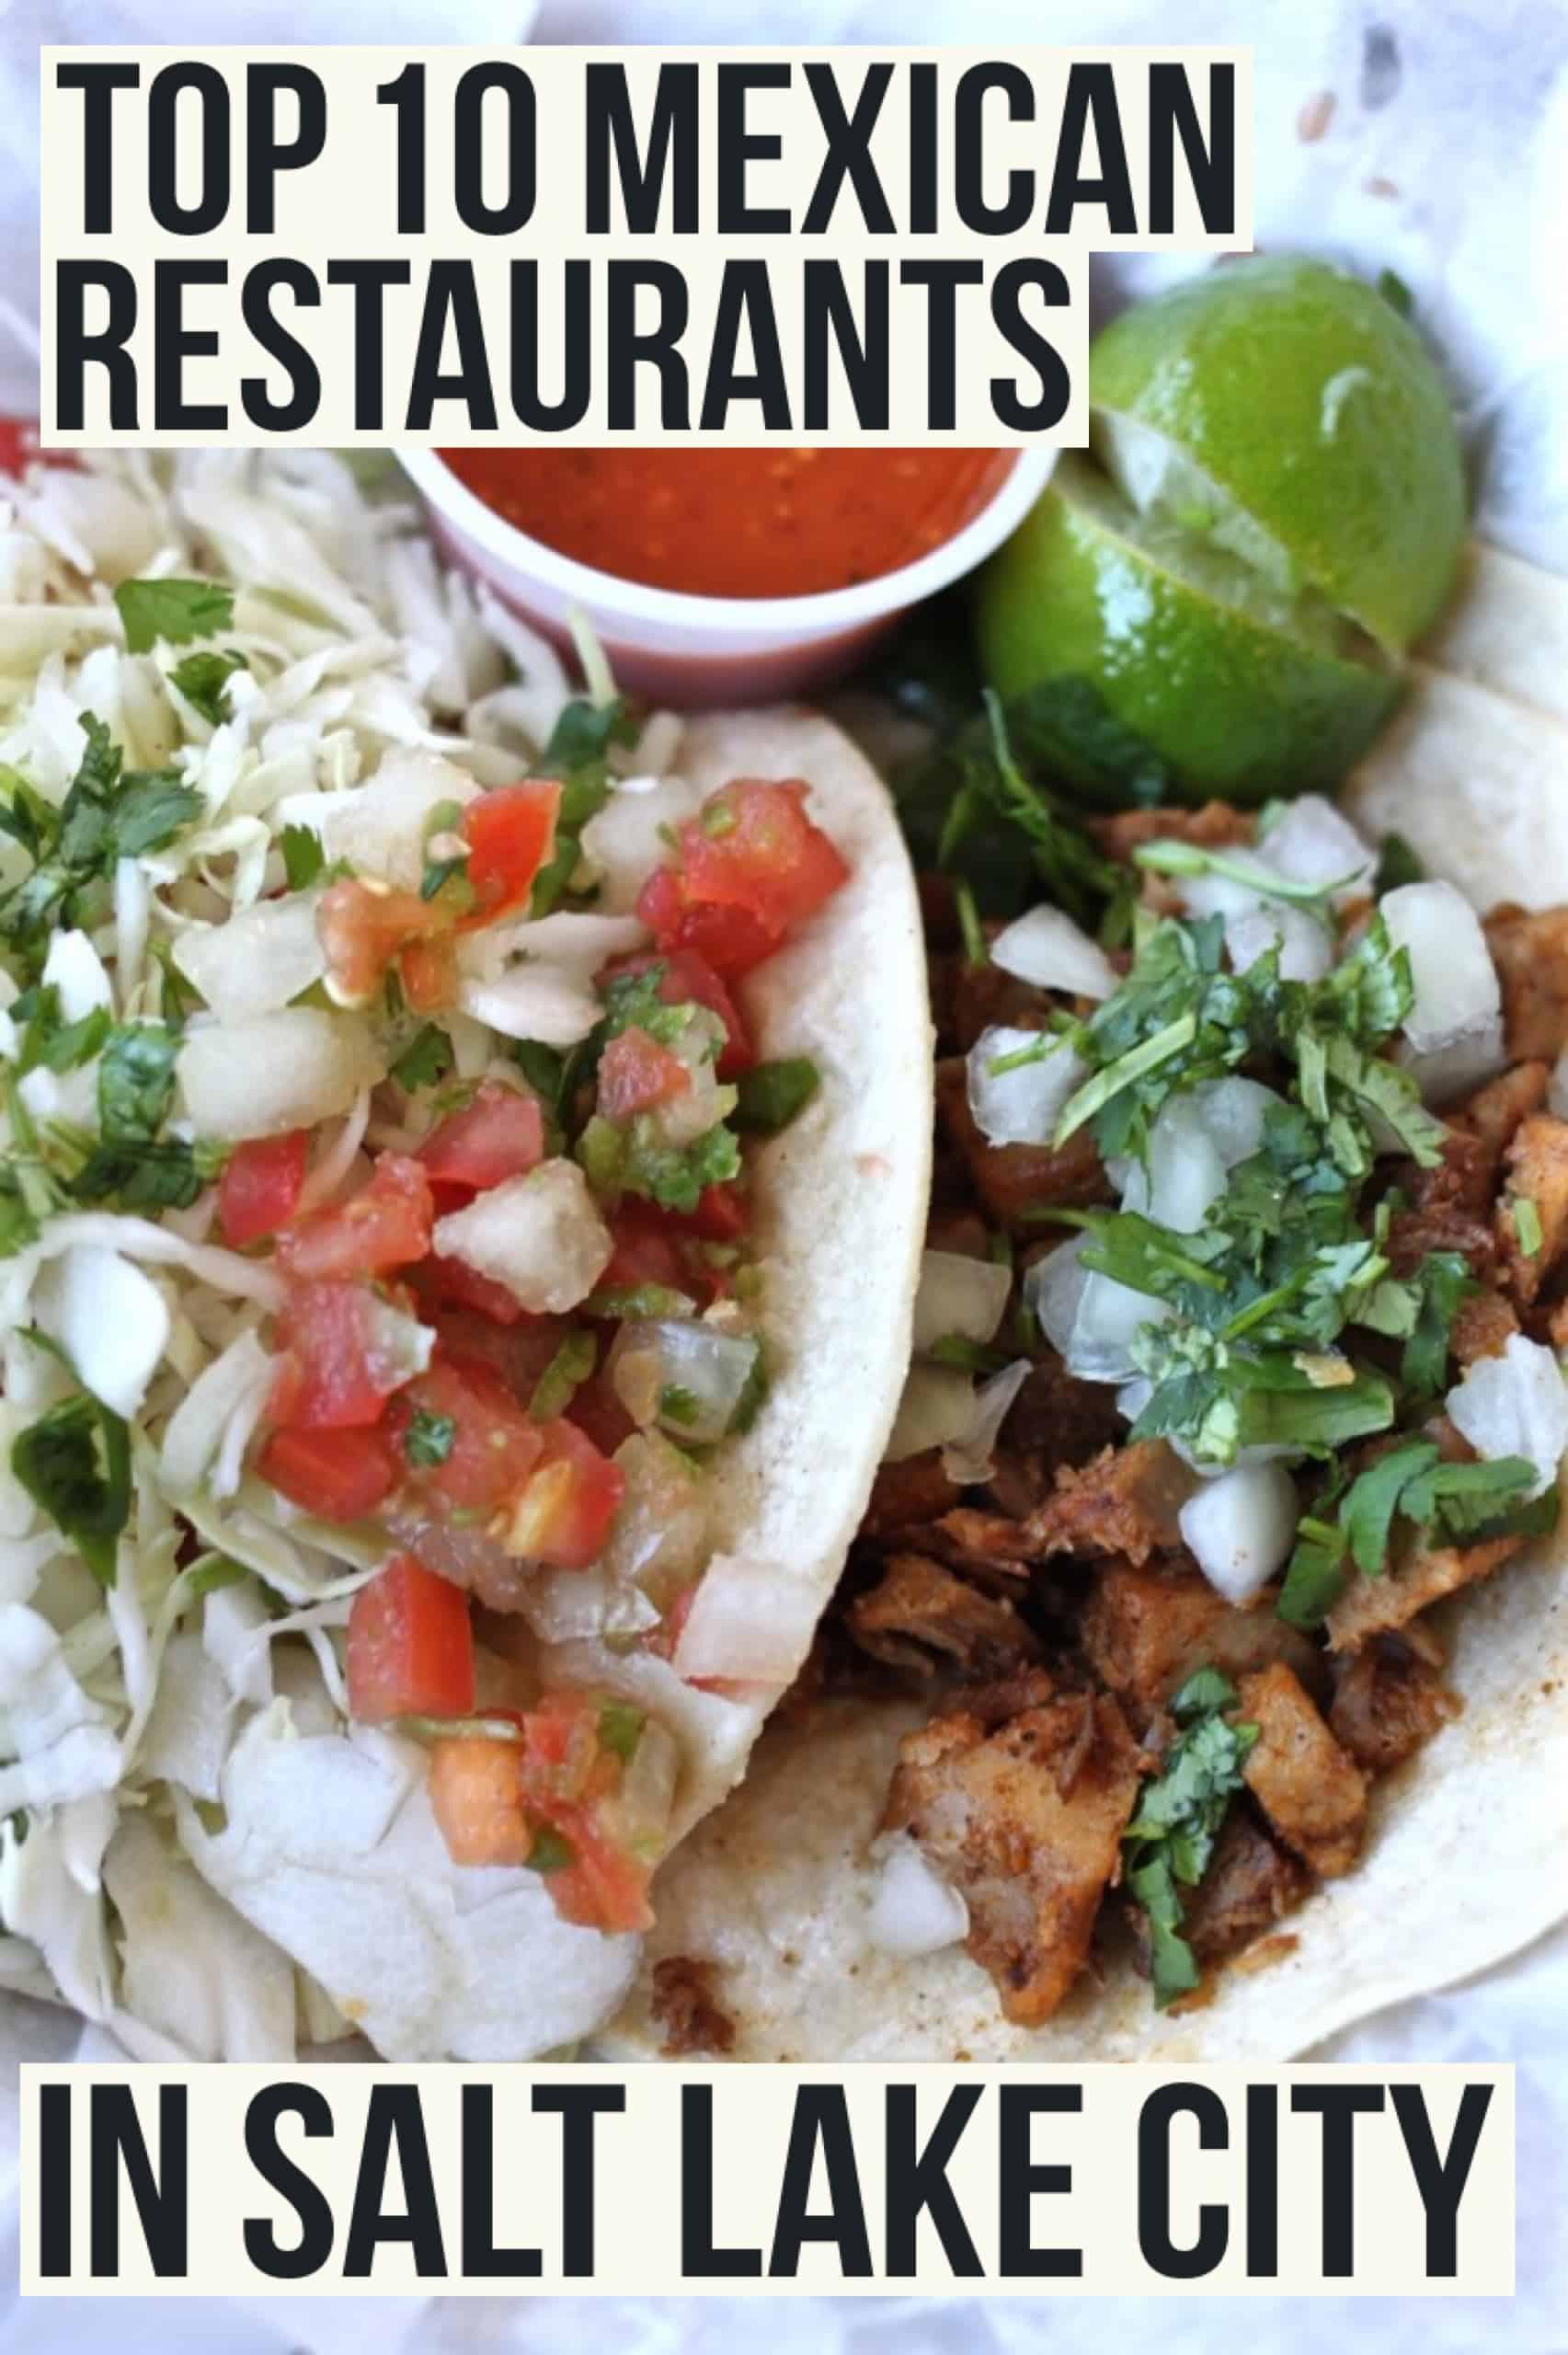 top 10 salt lake city mexican restaurants female foodie. Black Bedroom Furniture Sets. Home Design Ideas